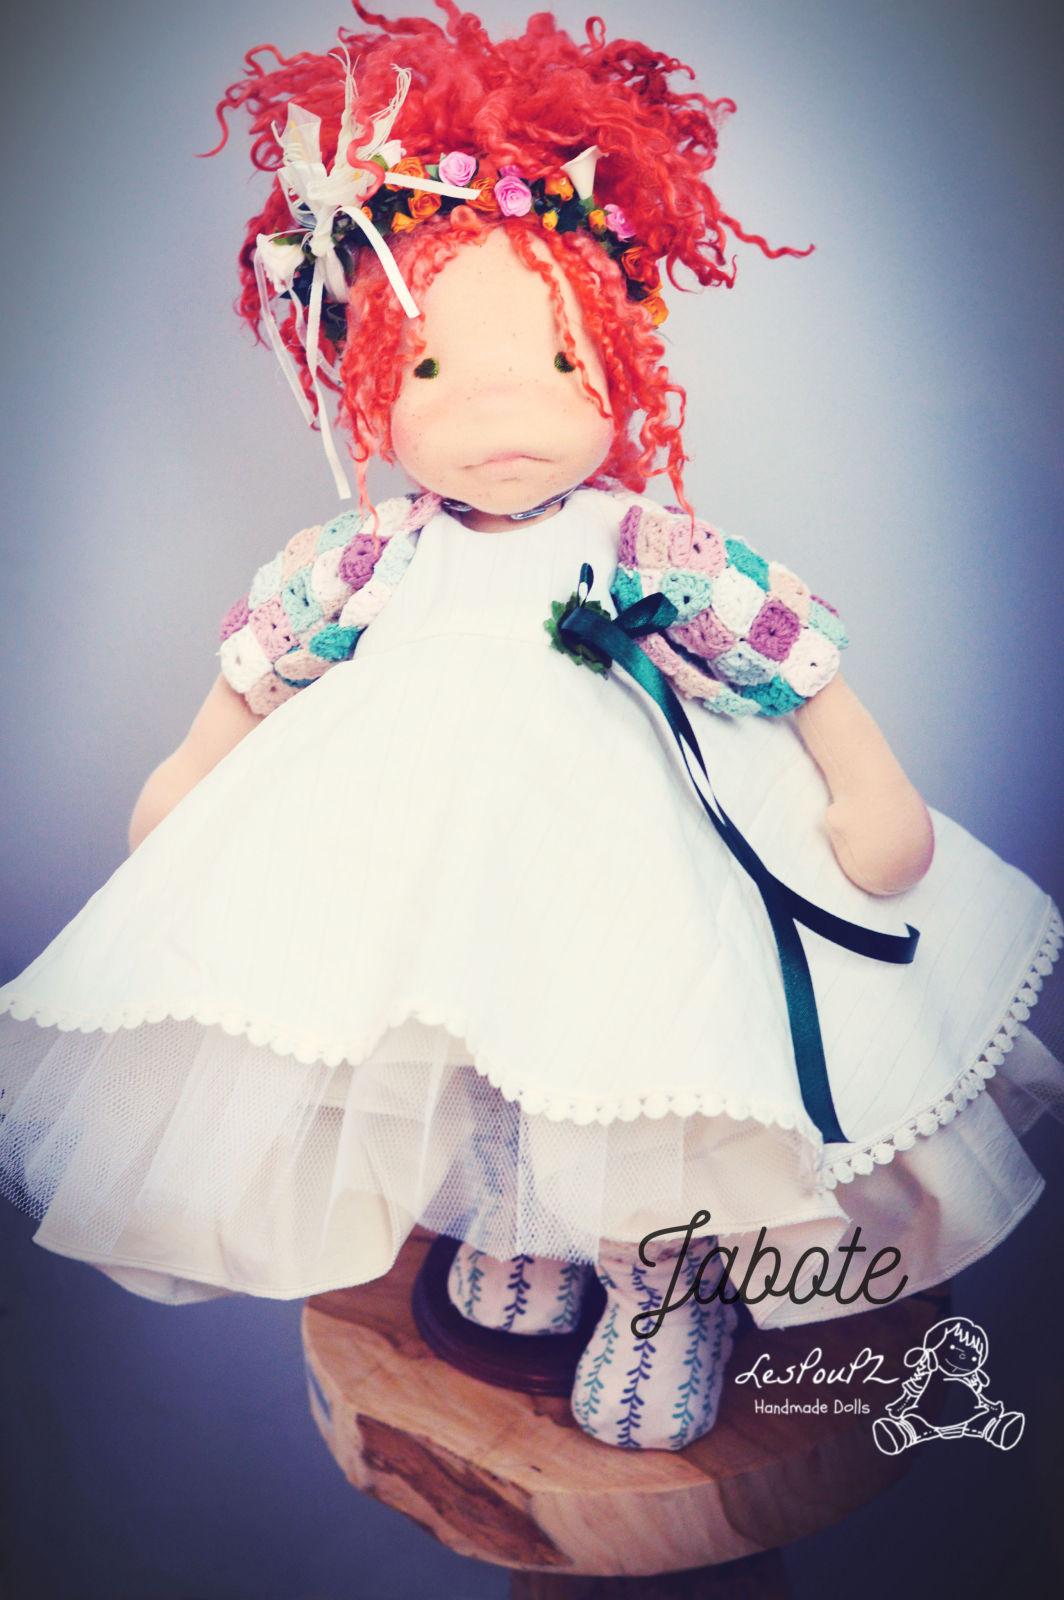 - a romantic doll